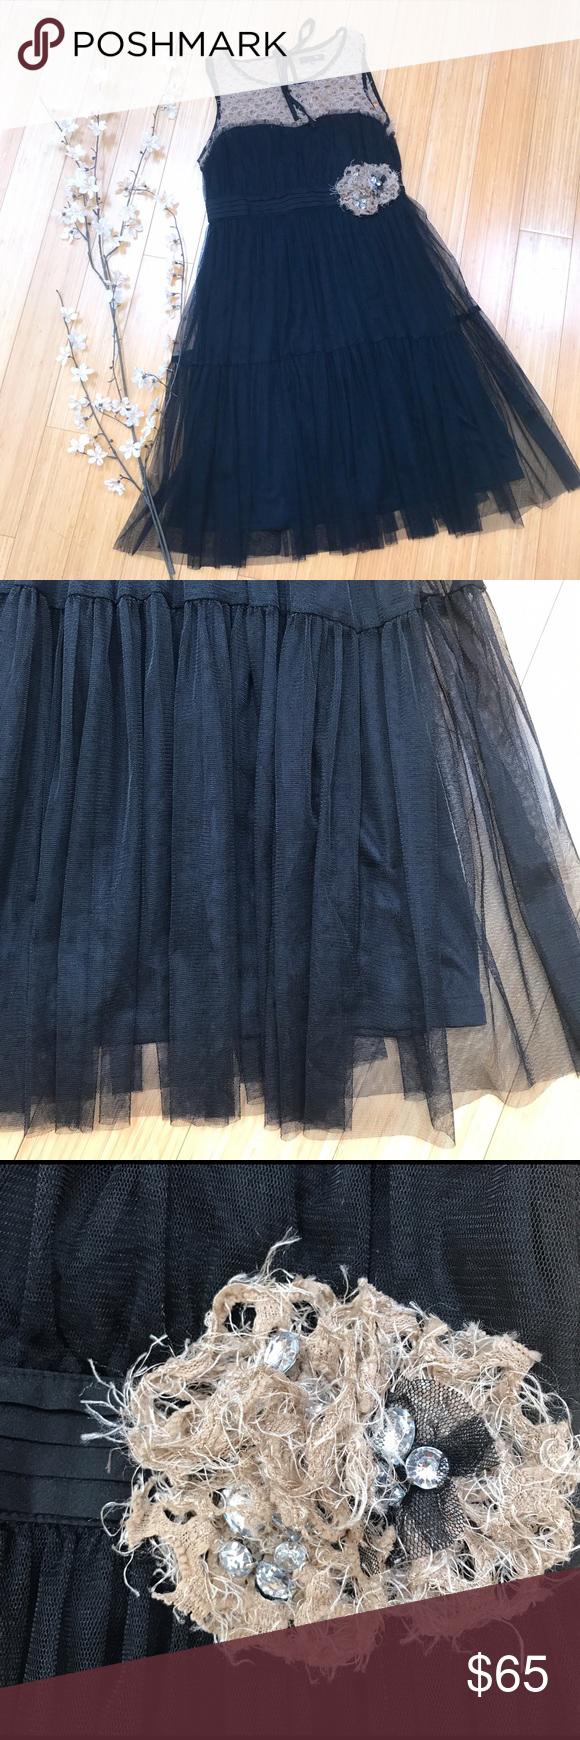 Black dress under 20 inches